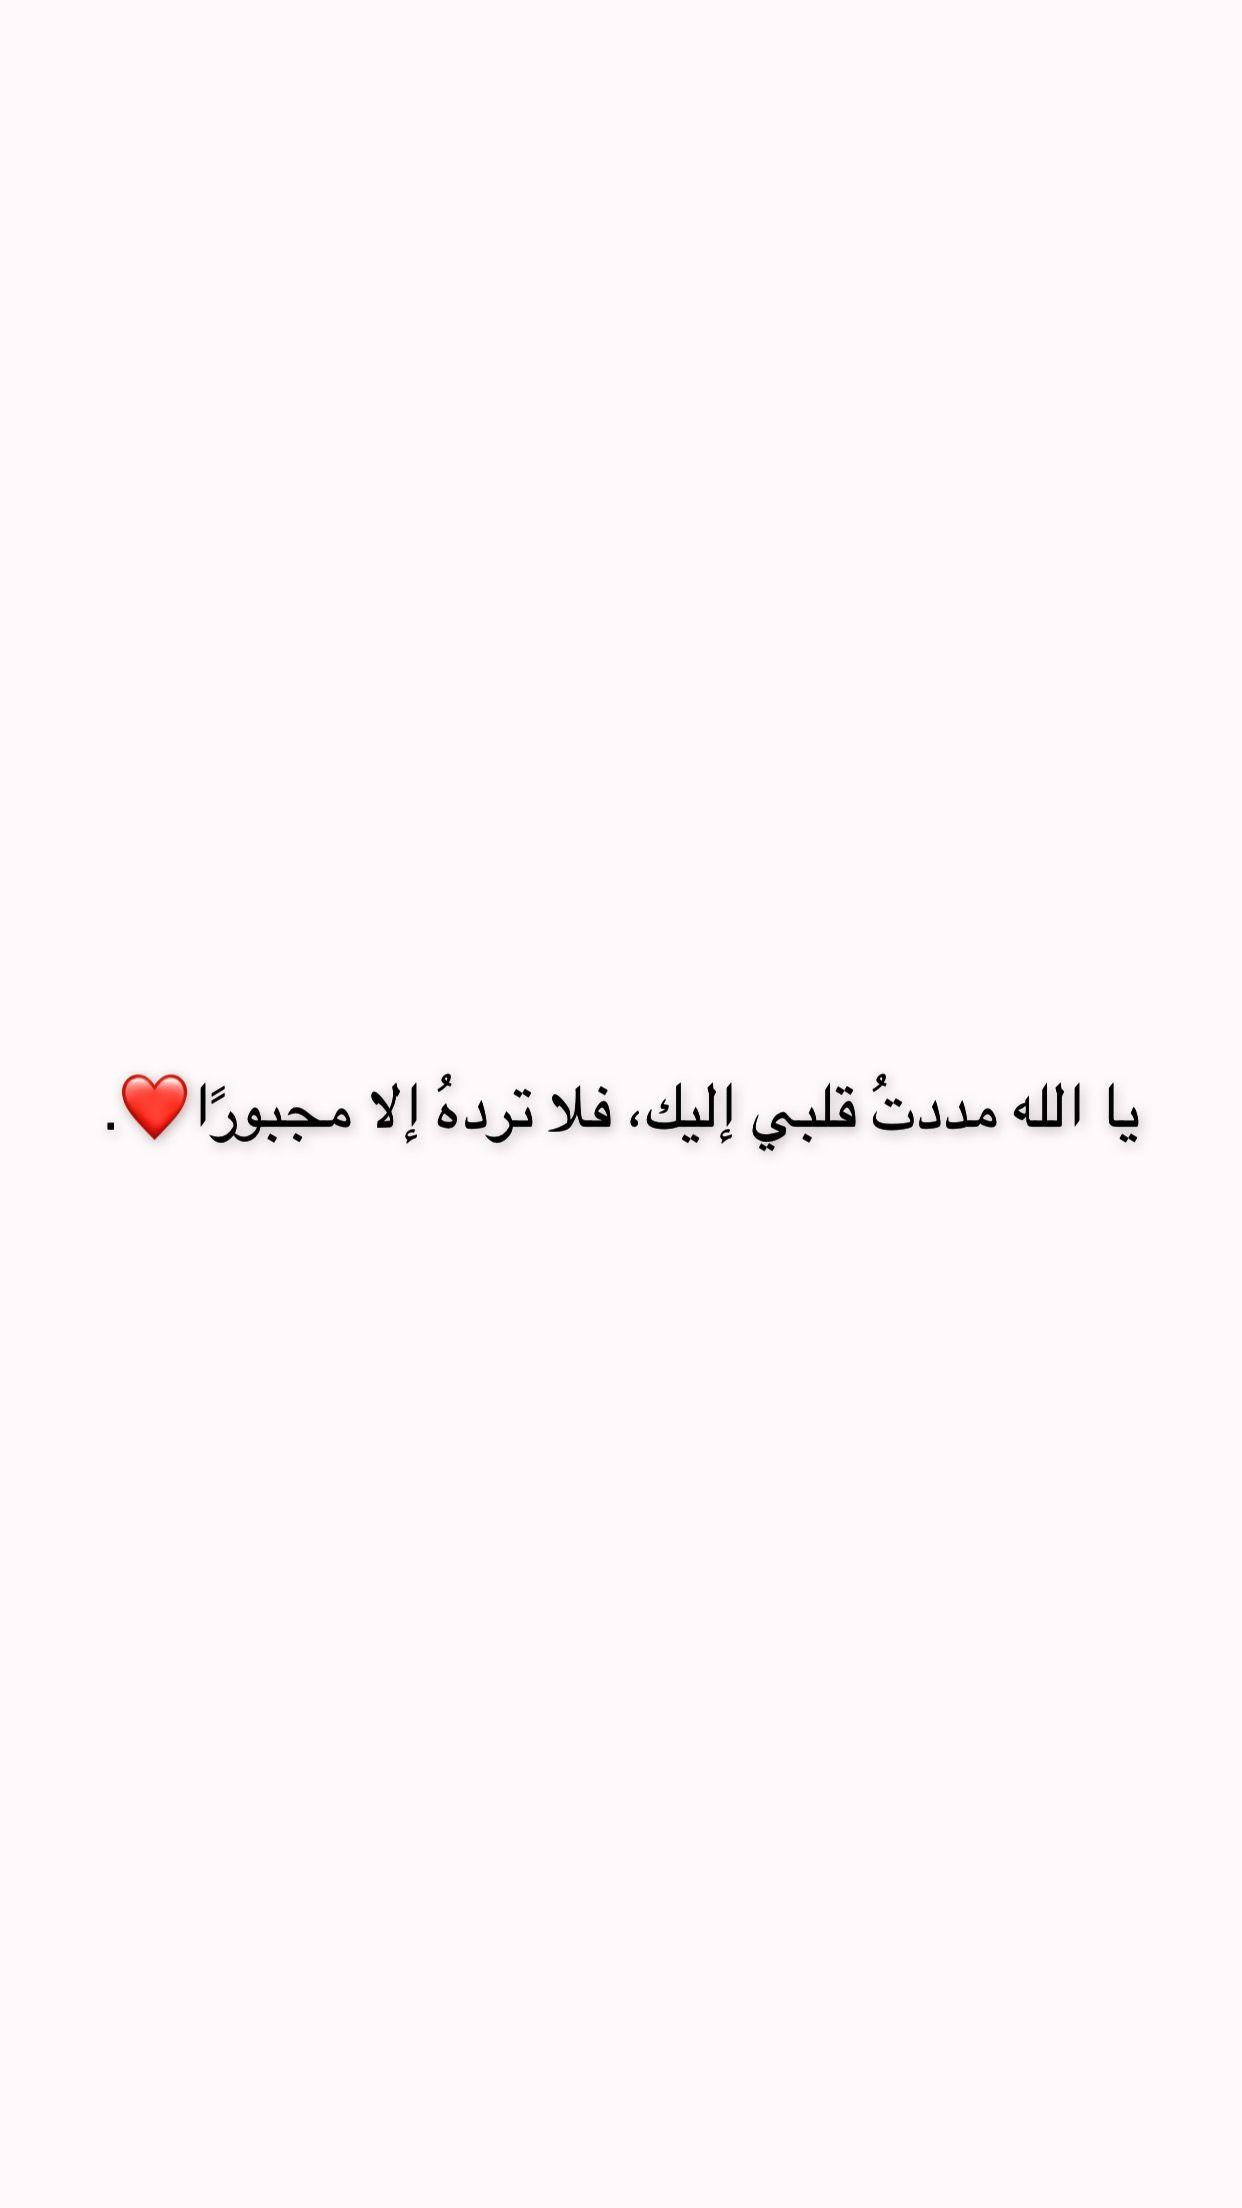 Pin By Yusra Asmar On Snapchat Cheer Up Quotes Quran Quotes Verses Words Quotes